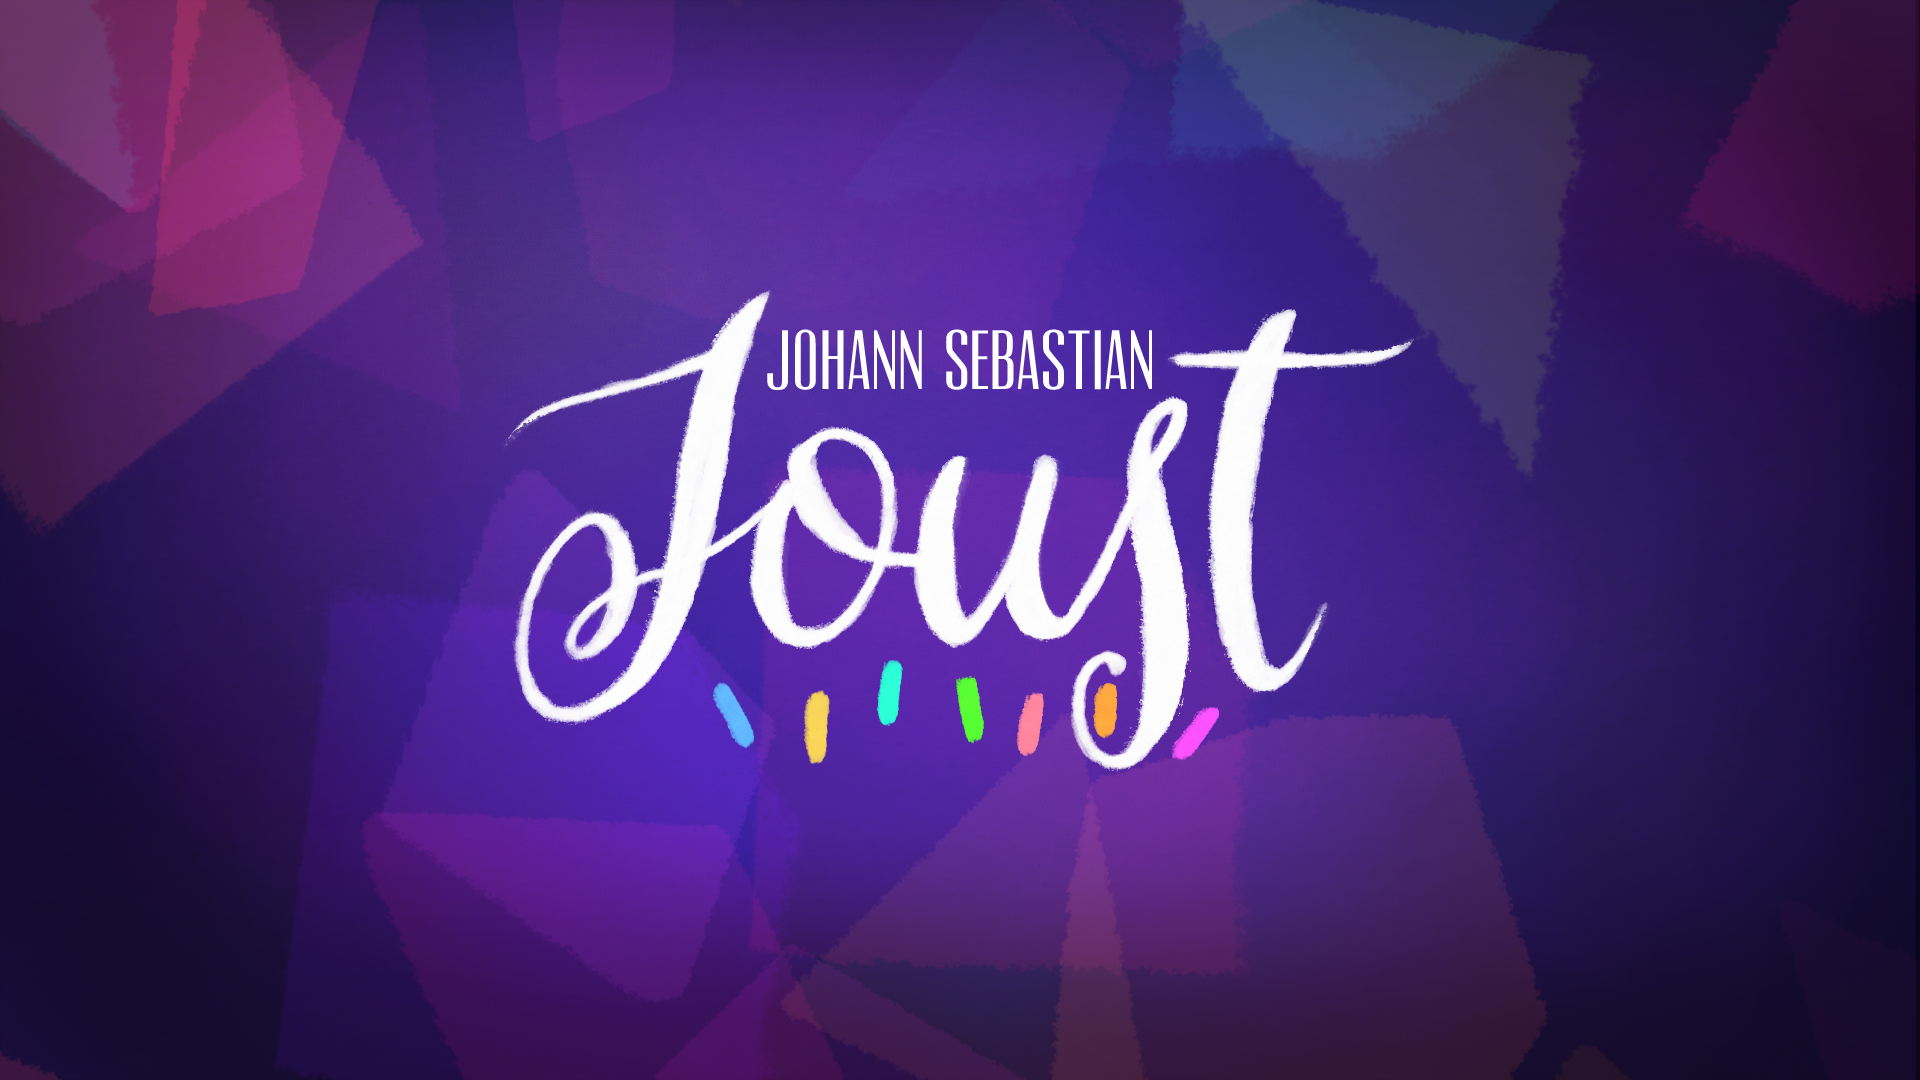 Johann Sebastian Joust (2014)